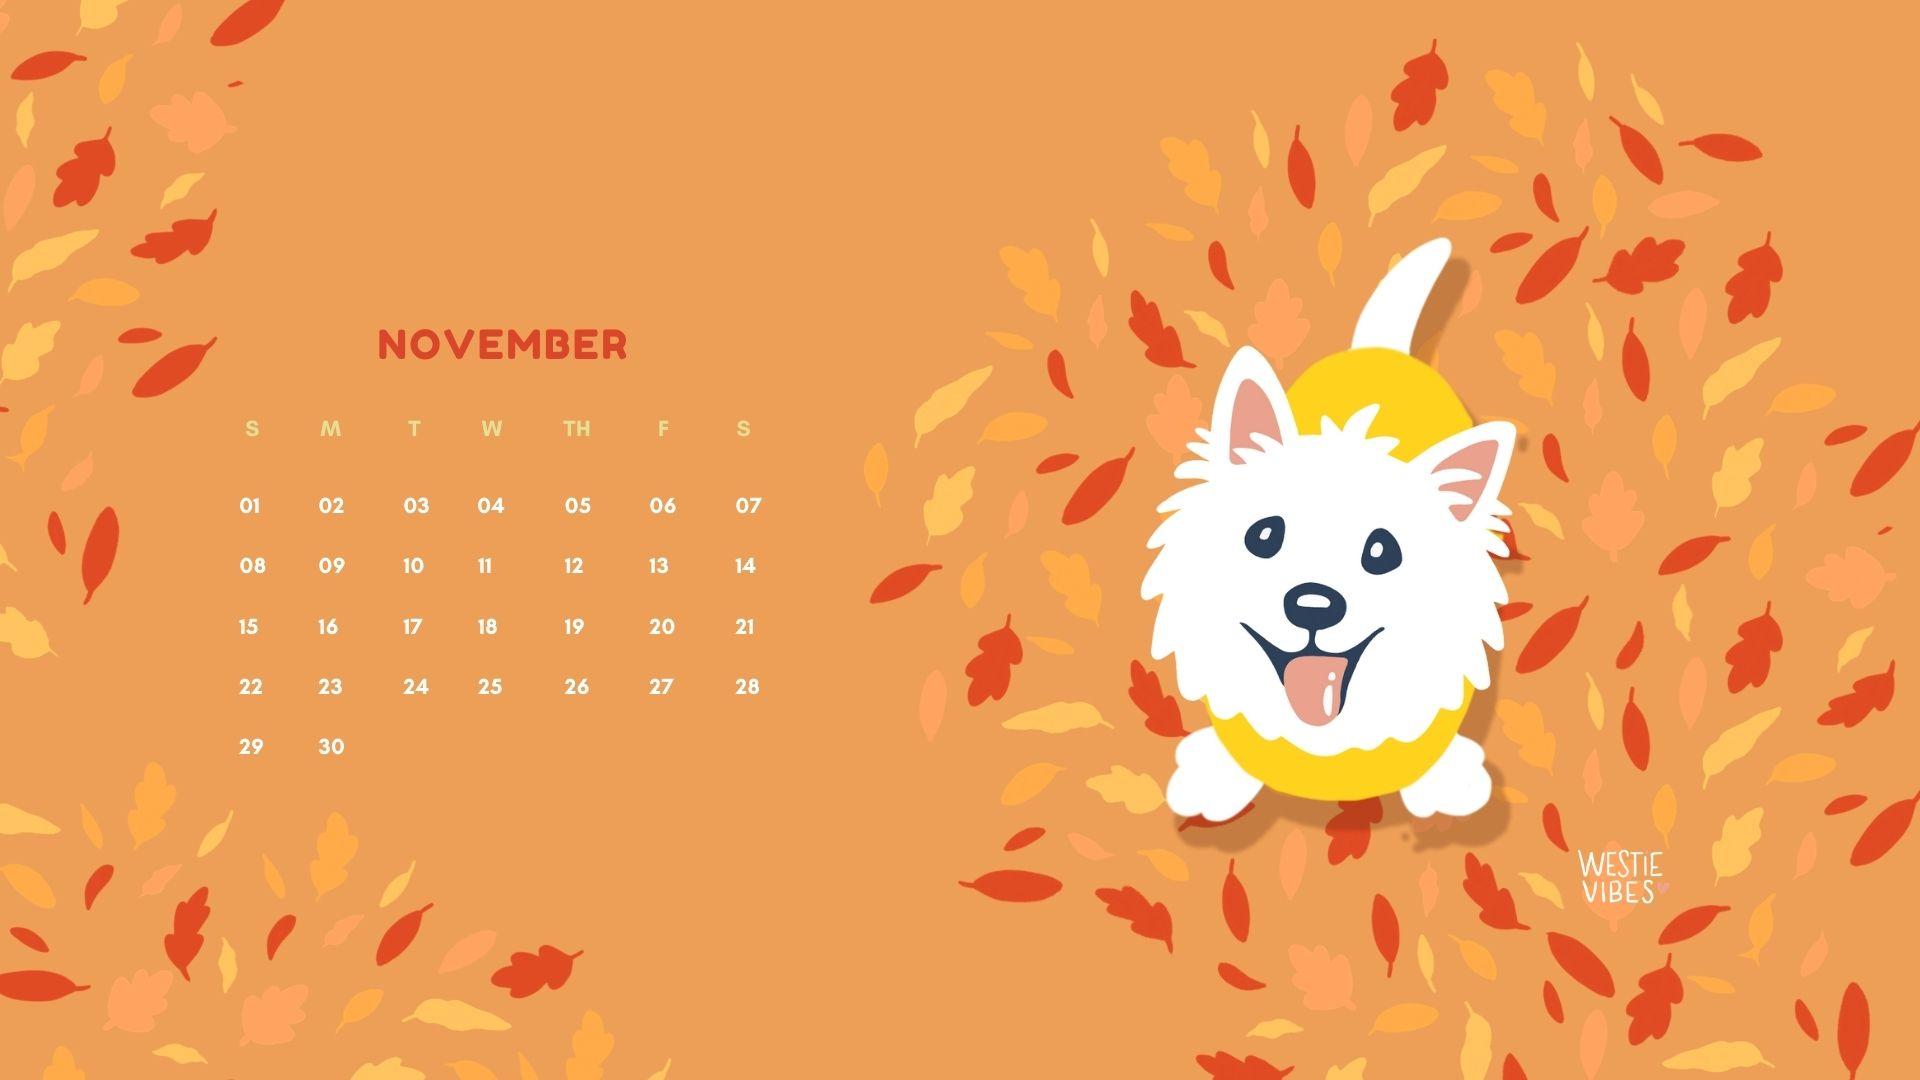 November Calendar Wallpaper Westie Vibes